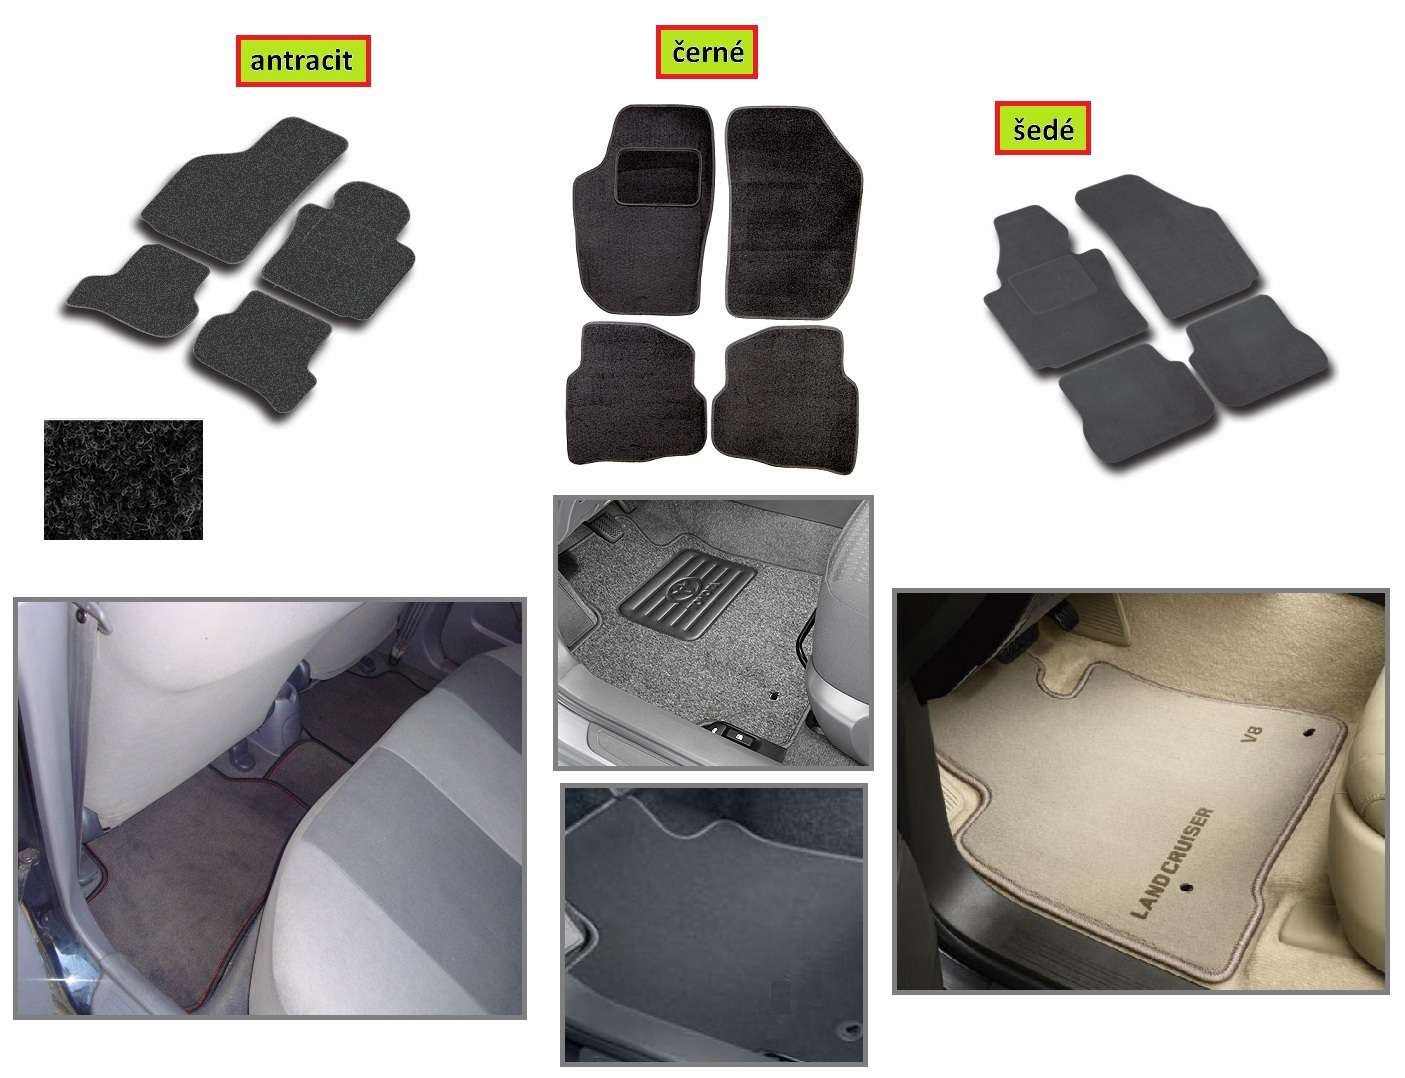 Autokoberce Citroen C3 Pluriel 2003 az 2005r, textilní přesné na míru autokoberce antracit